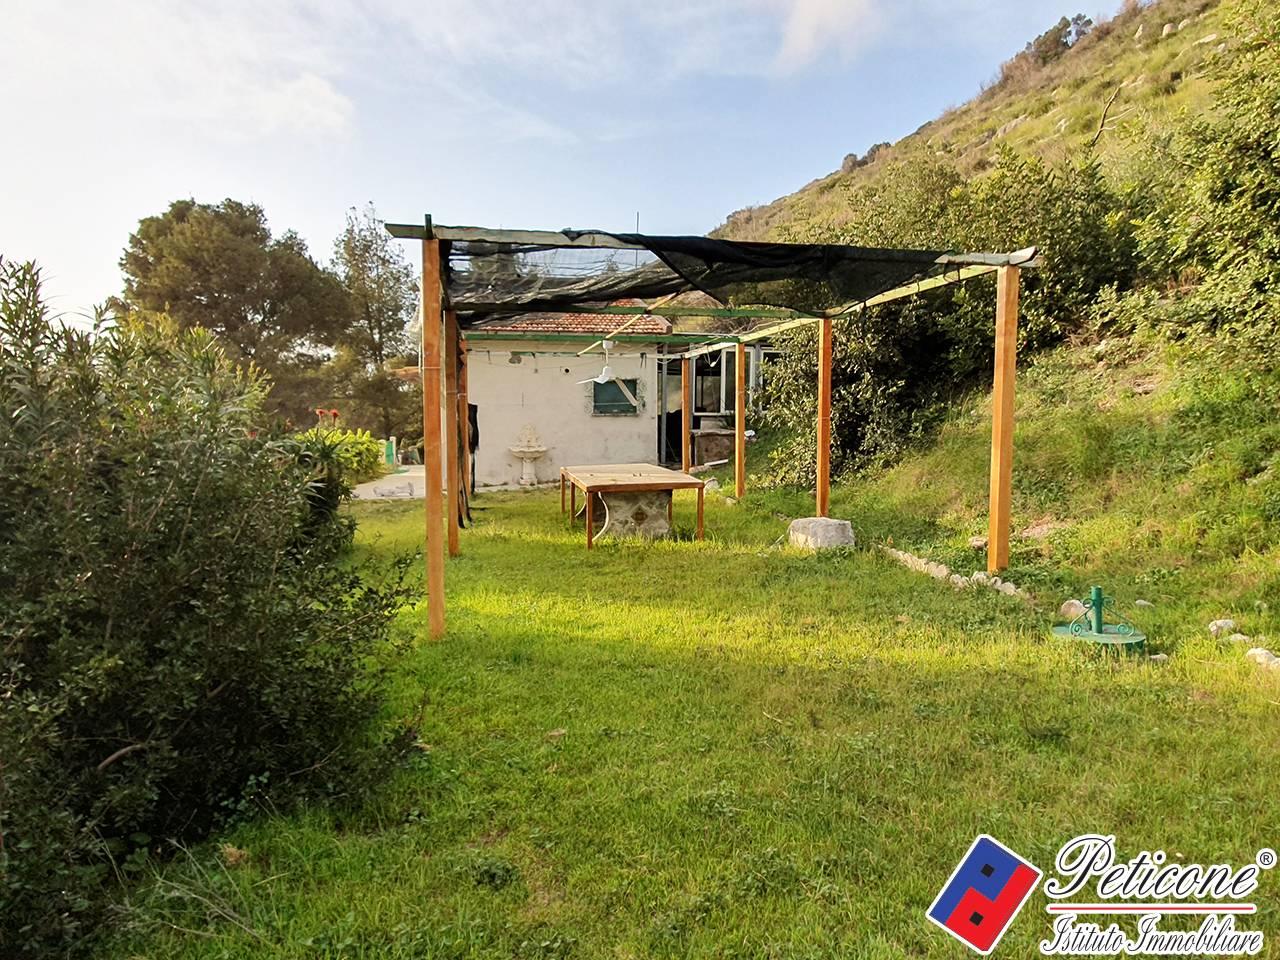 Villa in Vendita a Sperlonga: 3 locali, 50 mq - Foto 11